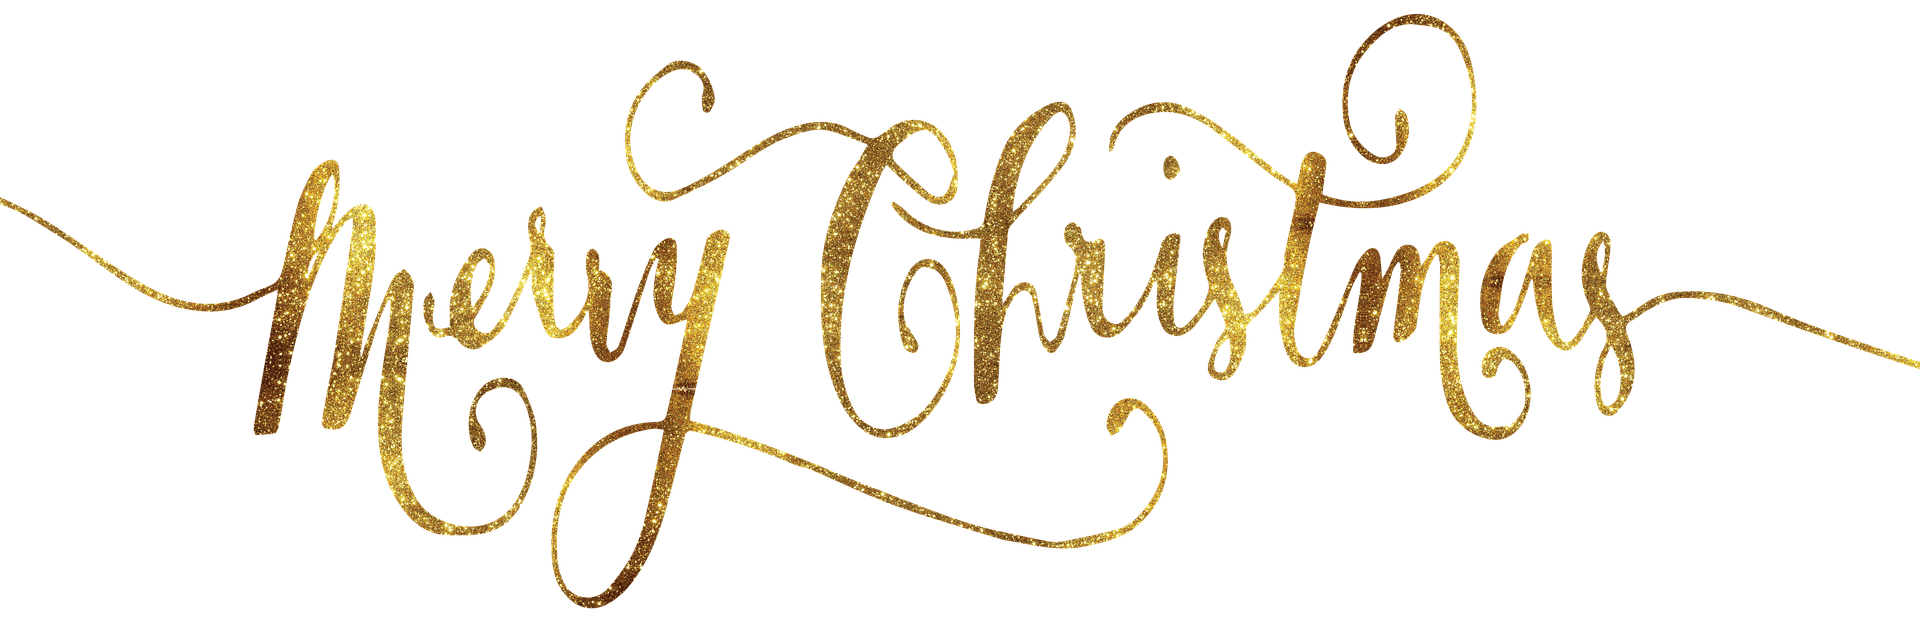 merry-christmas-1872500_1920